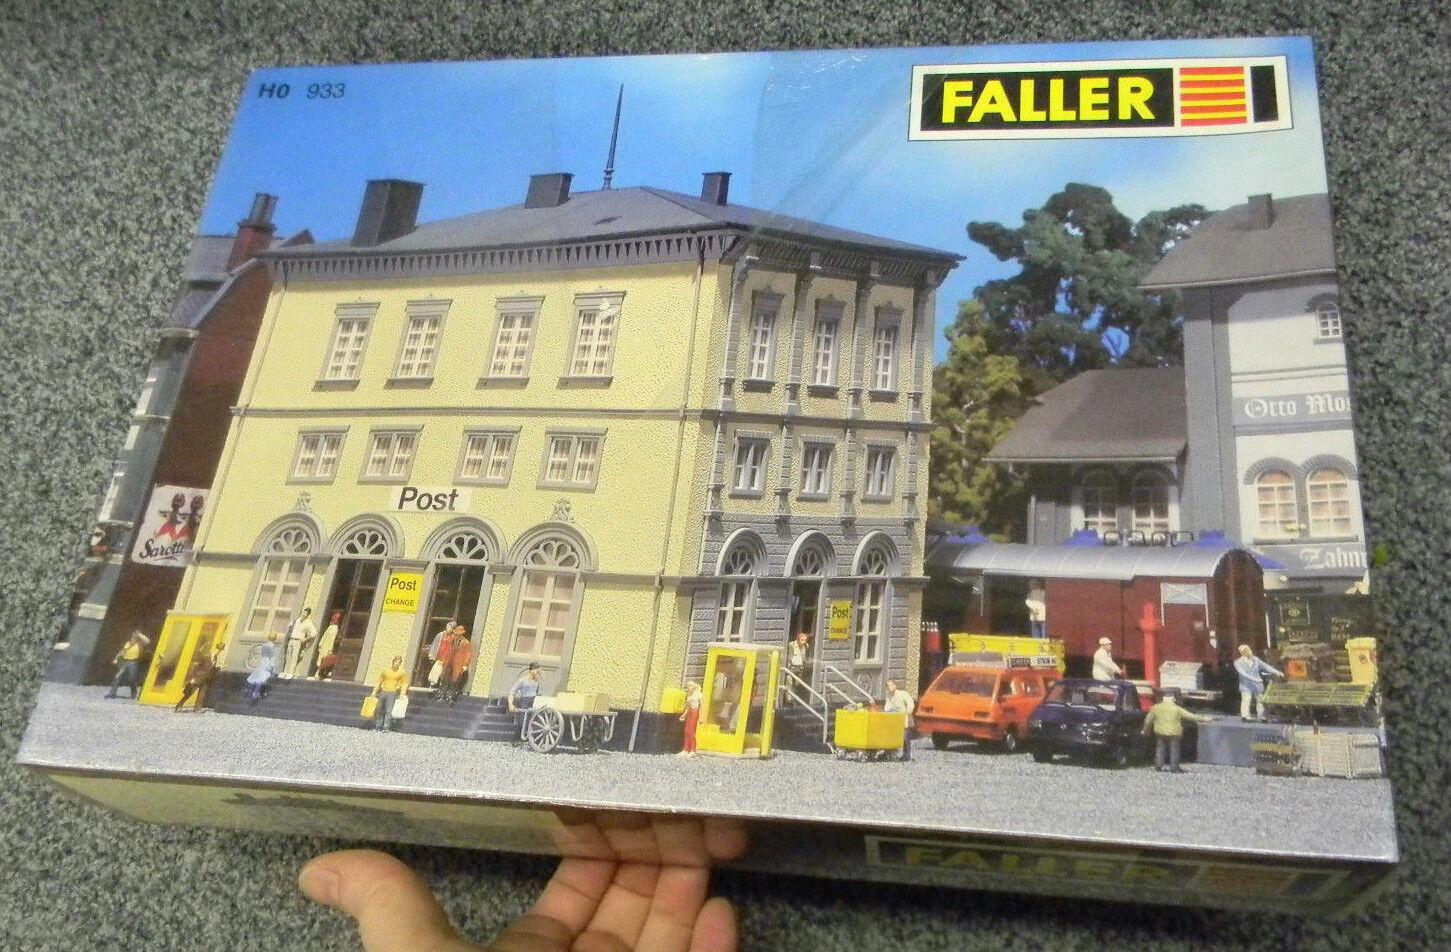 933 FALLER H0 Postamt Post office Bausatz 1 87 HO Neuw. OVP modeltrain Diorama